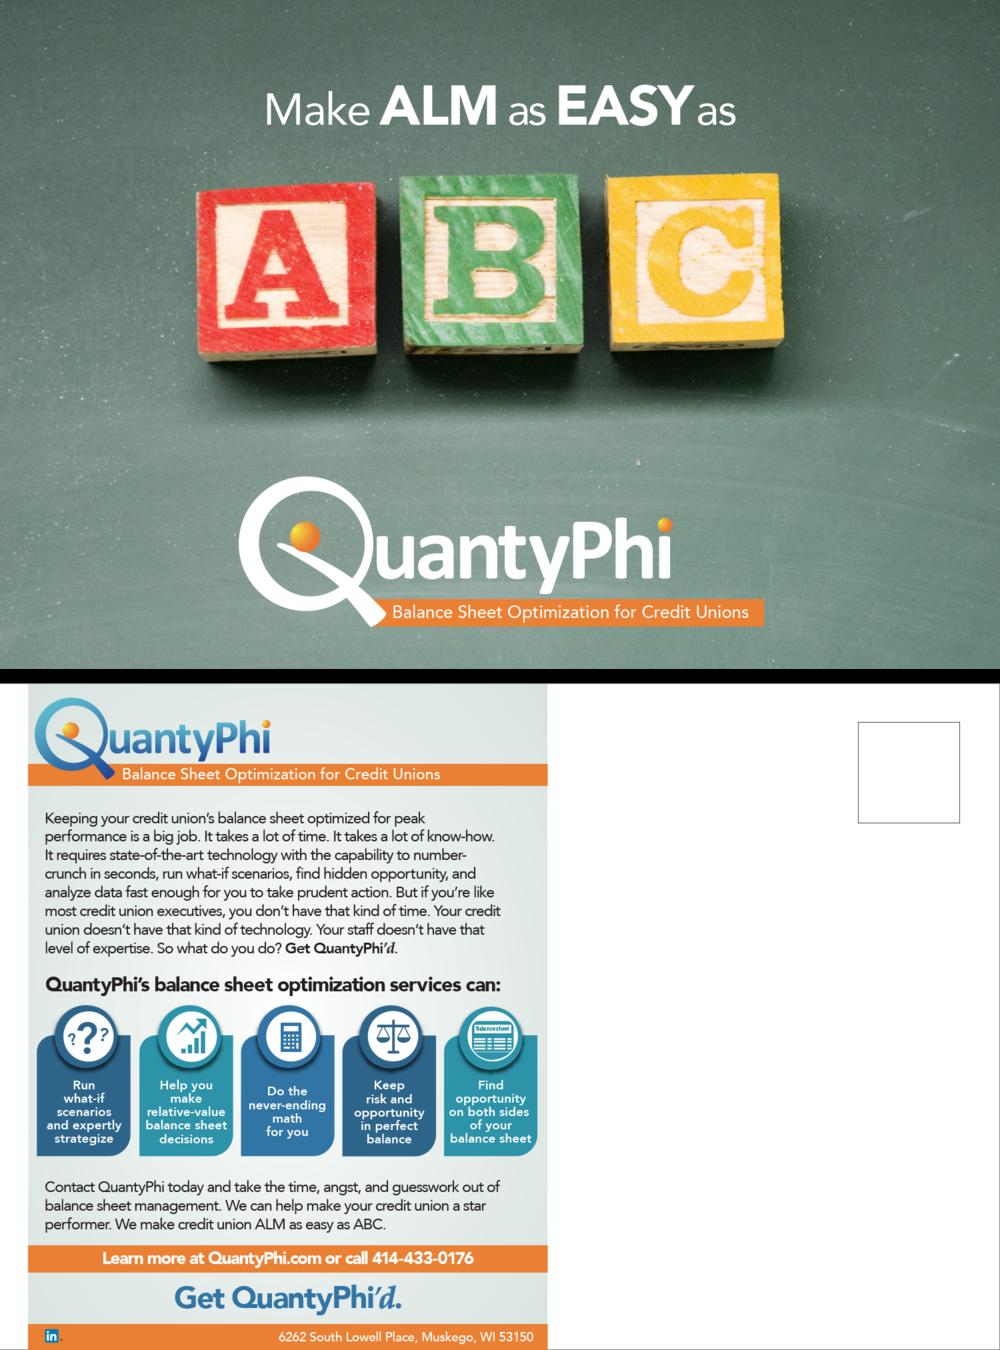 QuantyPhi_Postcards_Simple_ABC_052317.png